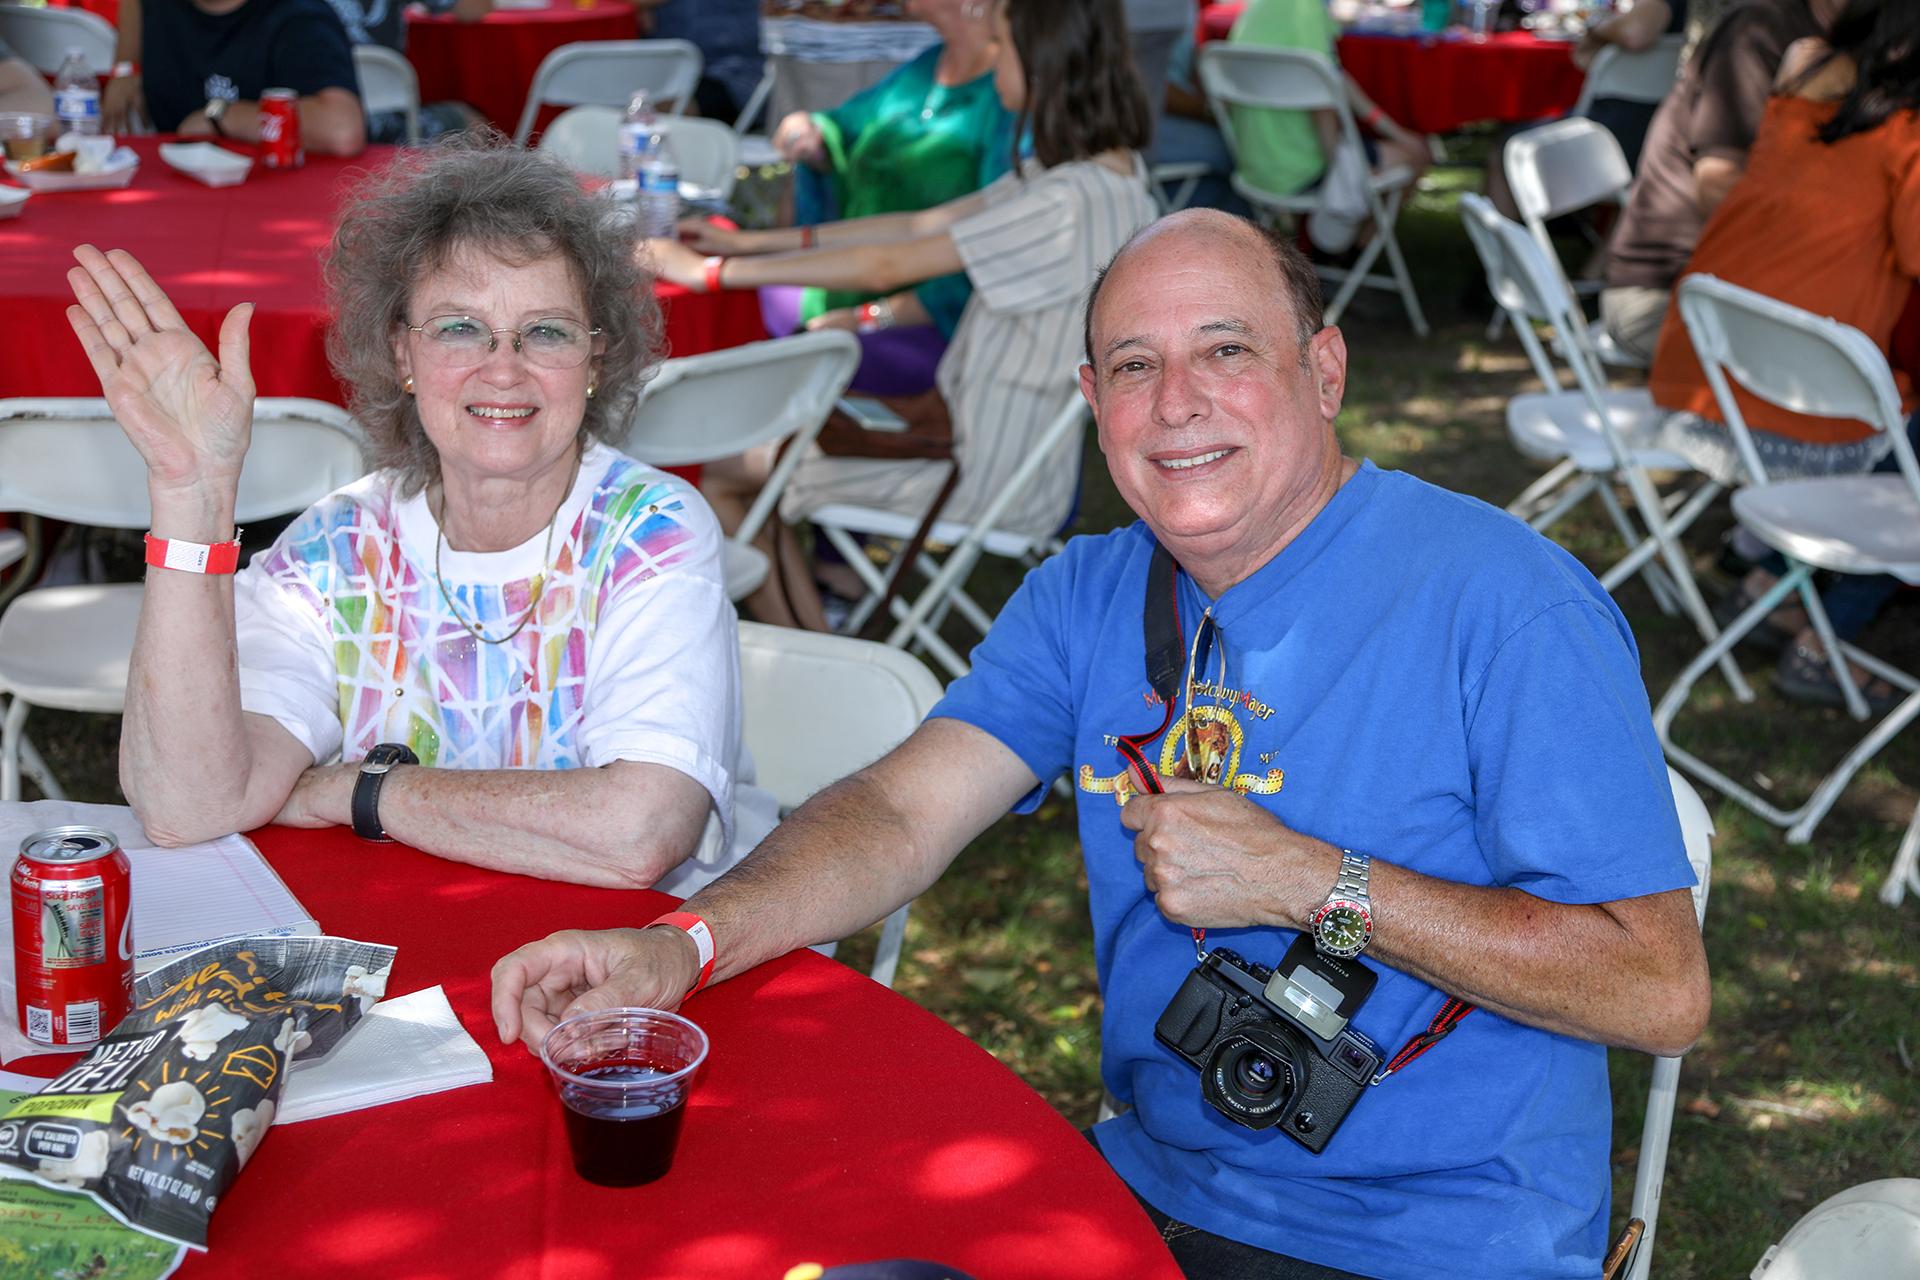 Carolyn Harris and Joe Santos